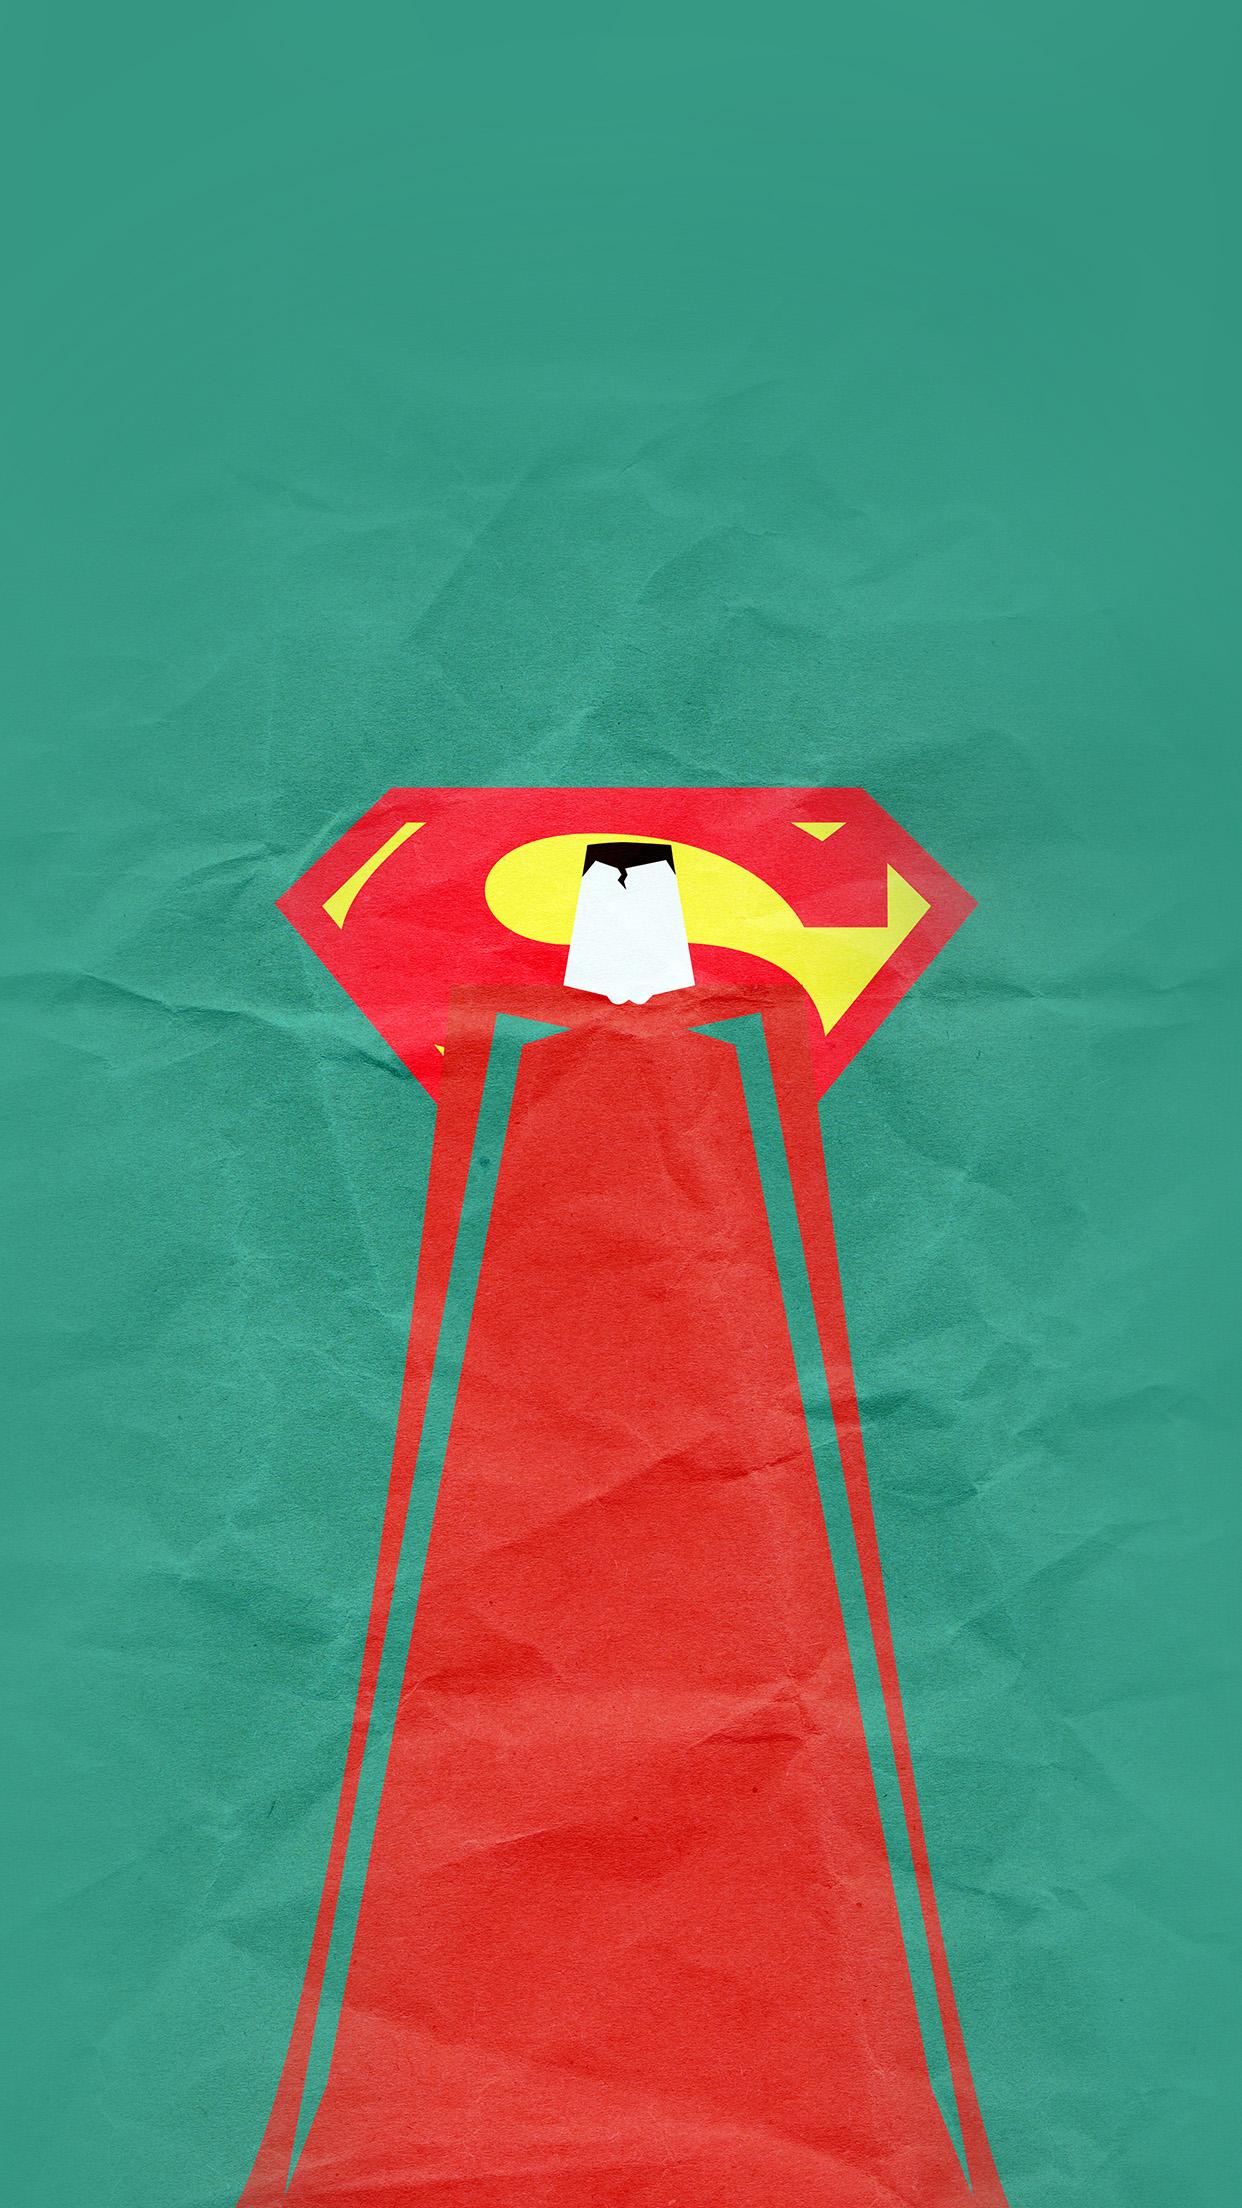 I love papers au68 superman minimal art illustration art green iphone 6 download ipad wallpapers voltagebd Gallery